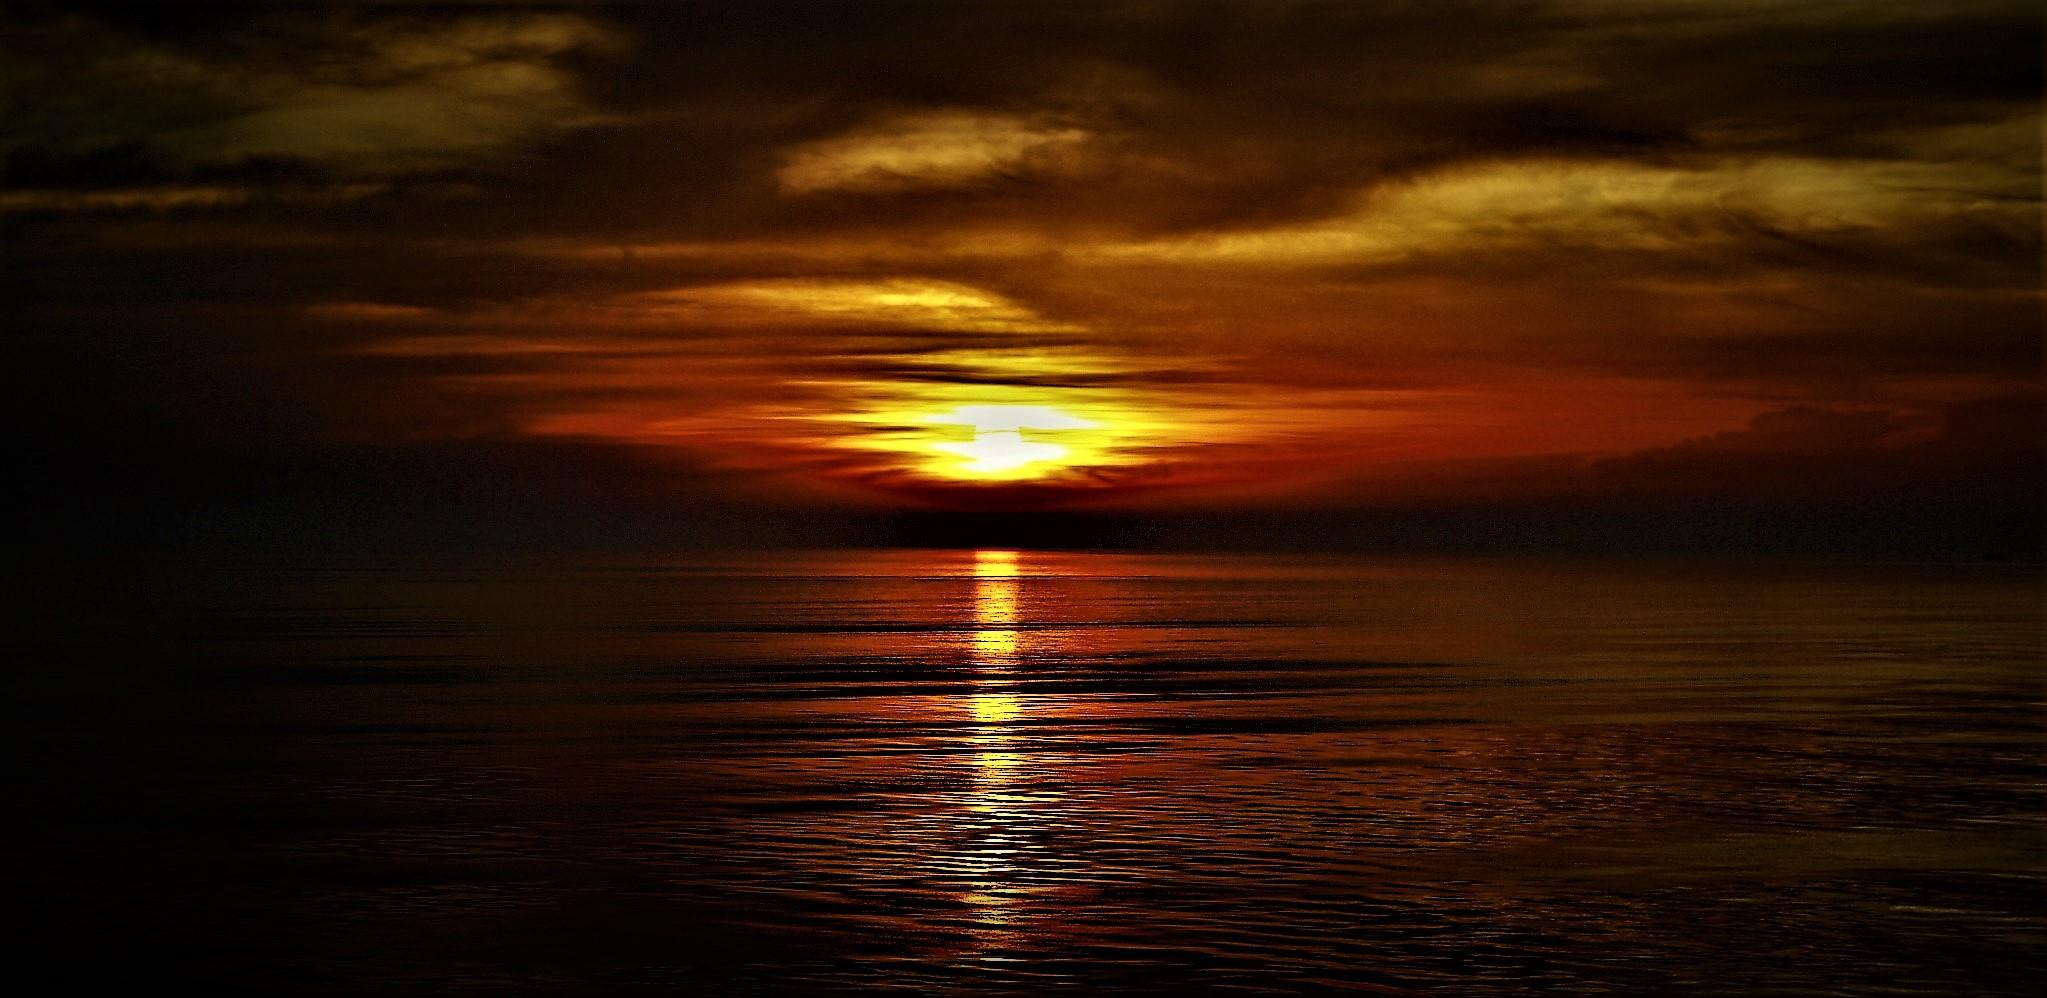 Sonnenuntergang bei Venedig